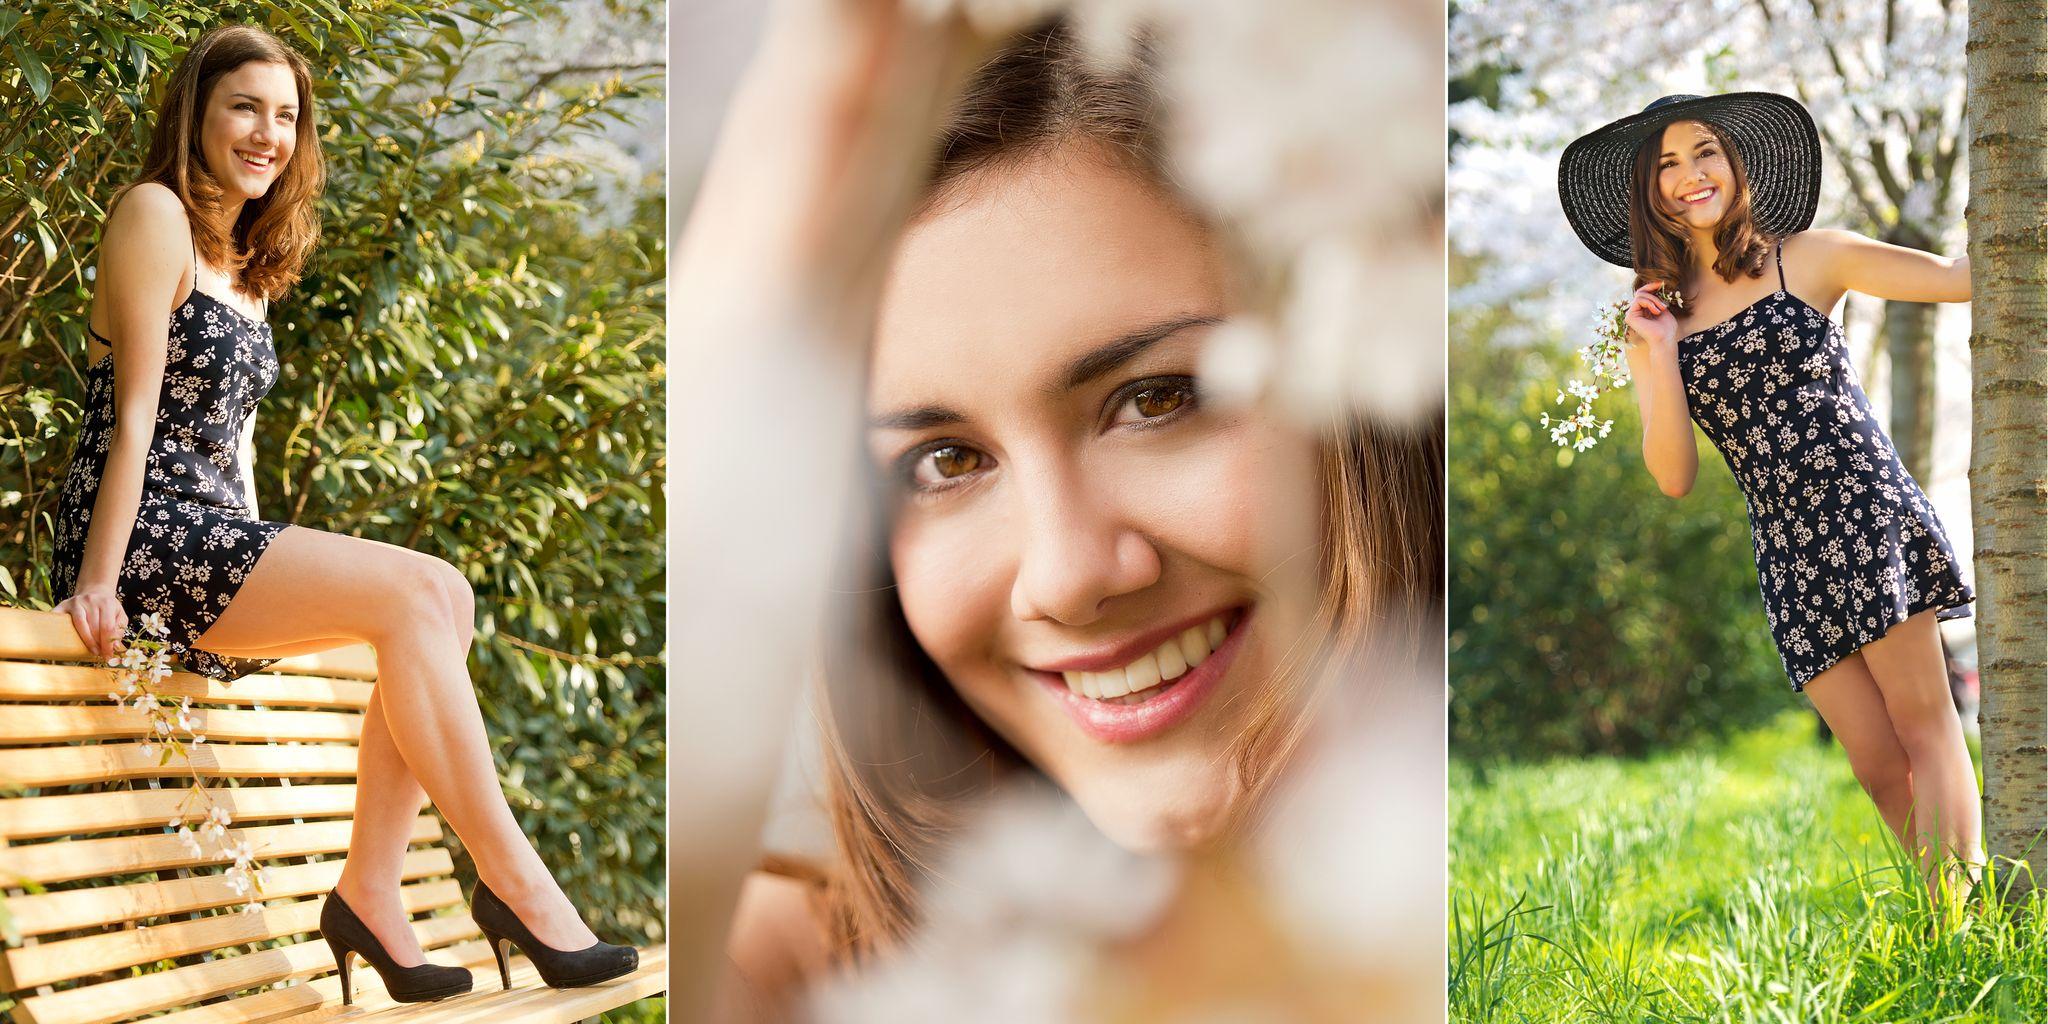 Beautyfotografie, Beauty, MakeUp, Haarstyling, Portraitfotografie, Businessfotografie, Fotostudio, Fotopgraf, Fotografin, Bewerbungsbilder, Familienfotografie, Industriefotografie, Veranstaltungsfotografie, Hochzeitsfotografie, Kinderfotografie, Fotograf, Fotografin, Fotostudio, Foto, Fotografie, Jena, Thueringen